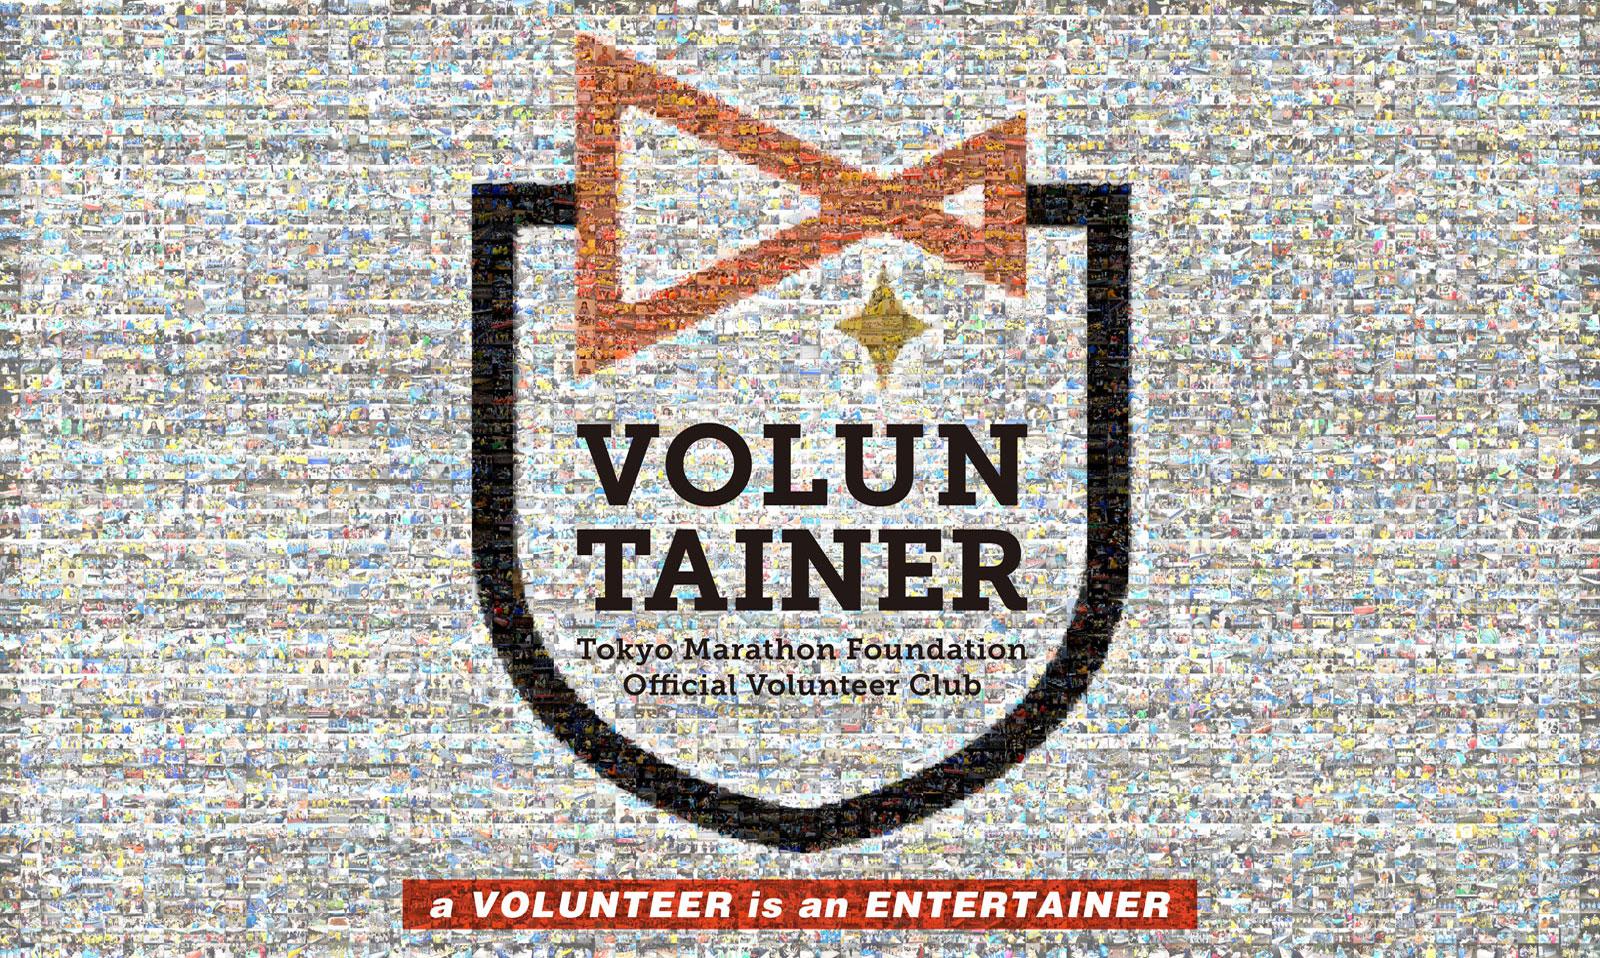 VOLUNTAINER 1周年記念 ビジュアル& ショートムービー